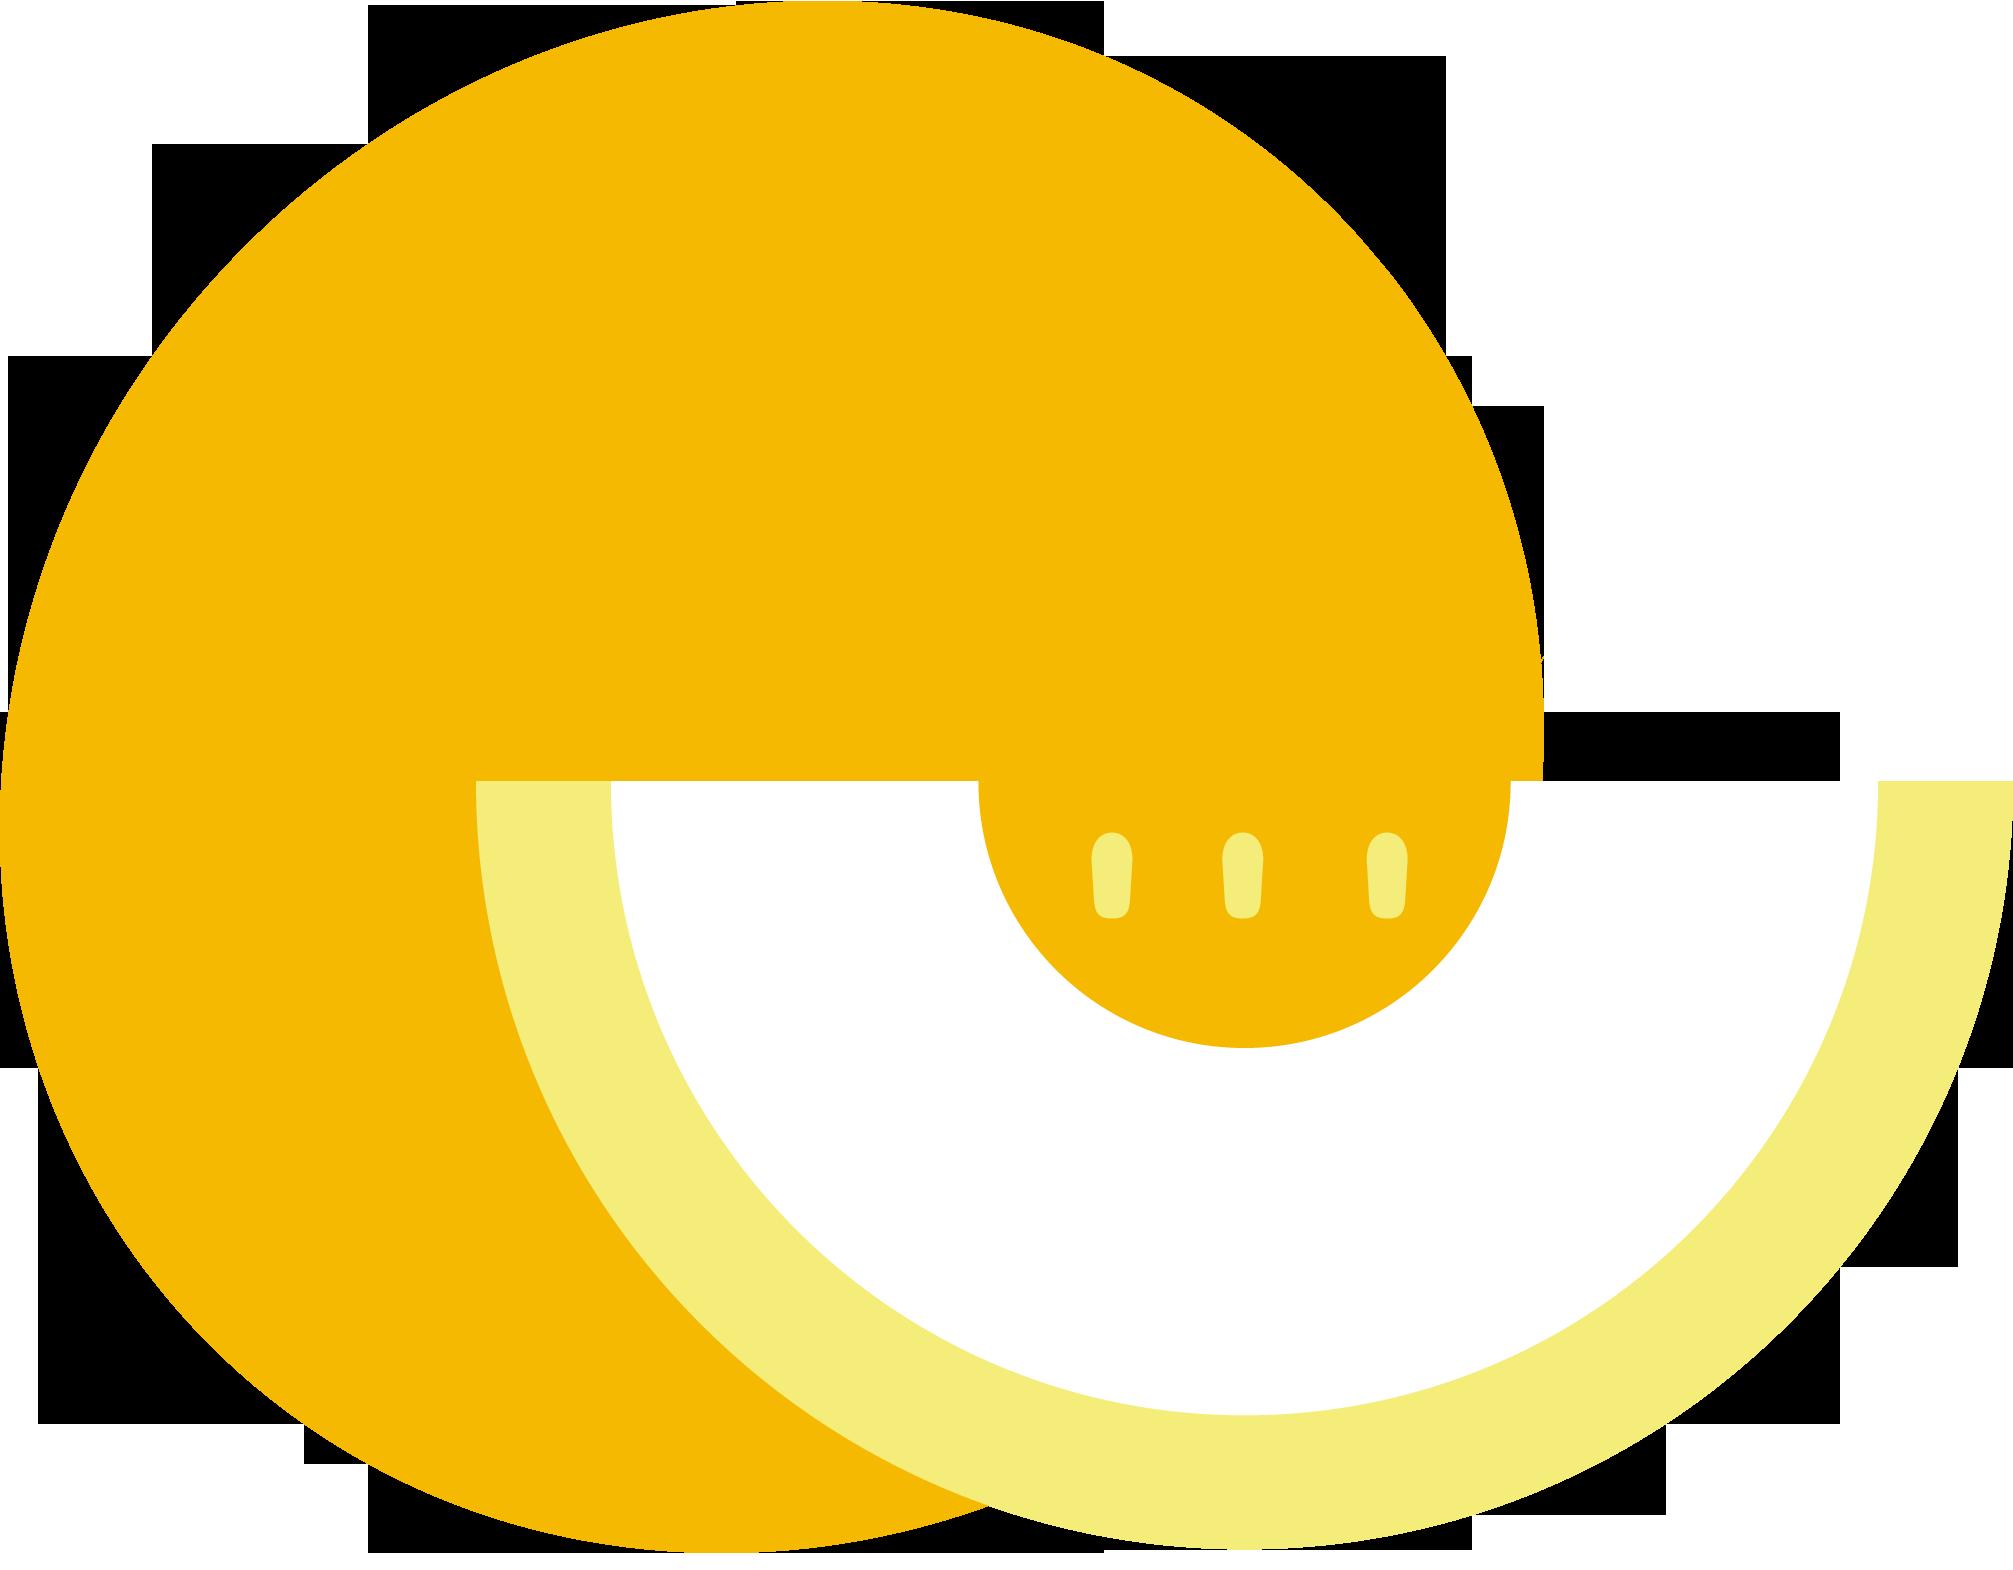 sandirey-melon-amarillo-02